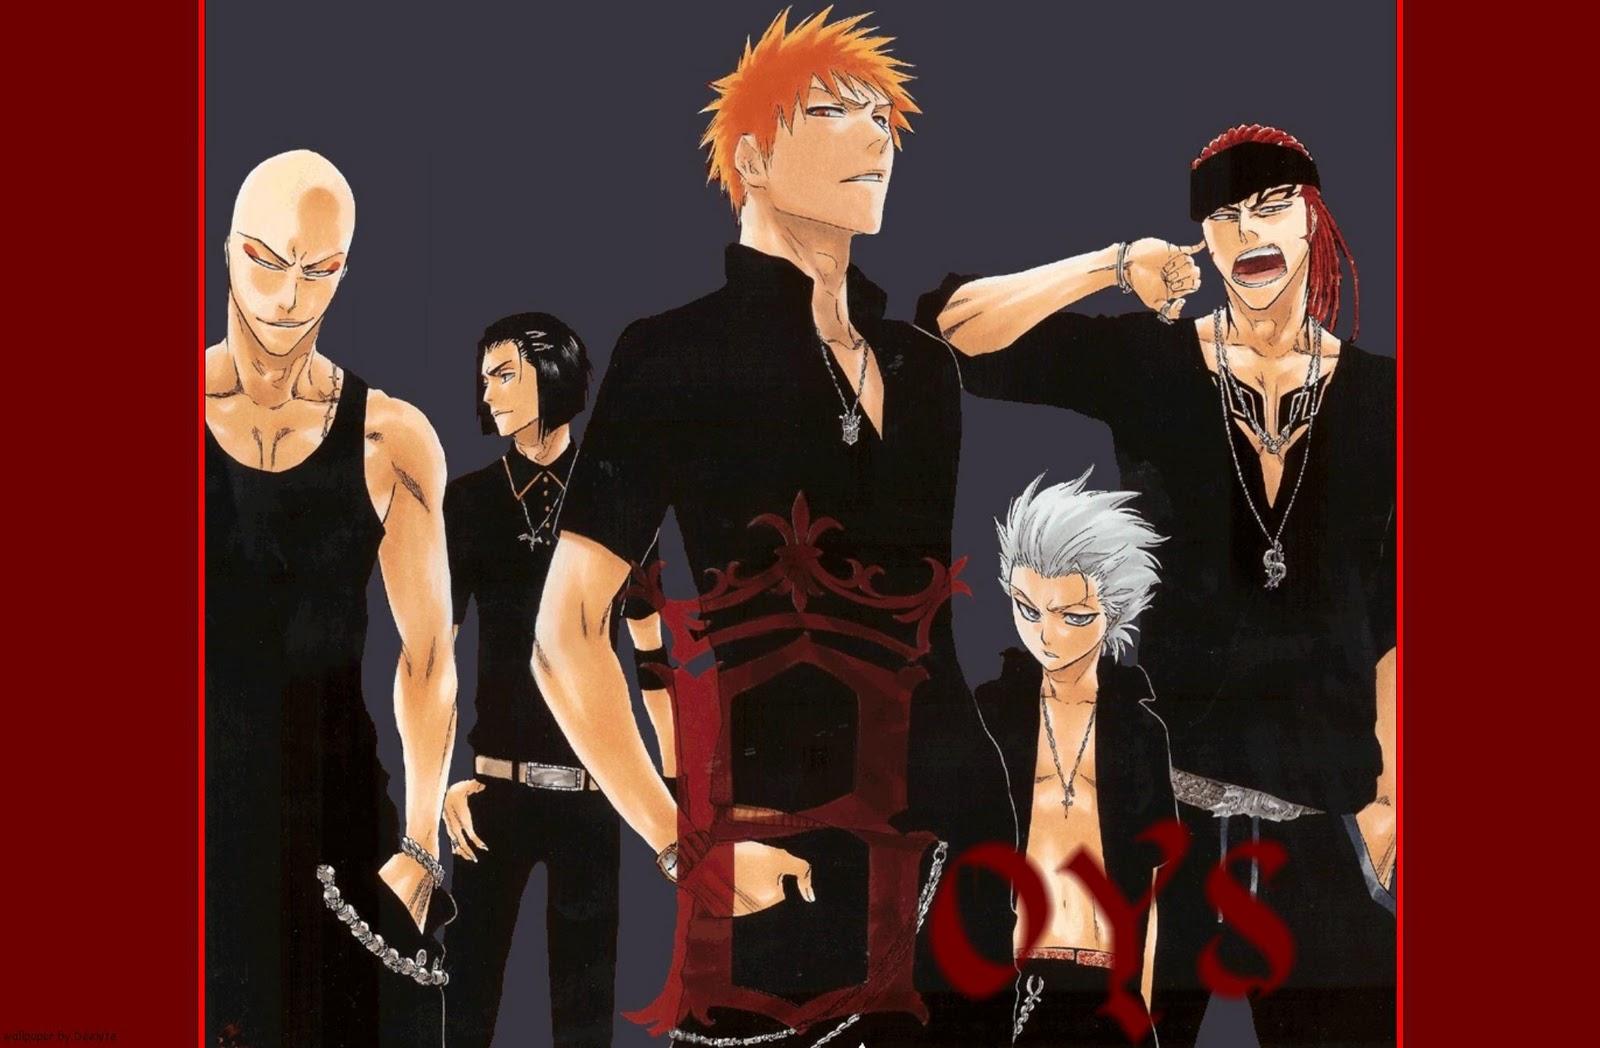 Free Wallpapers: Anime boys Wallpaper